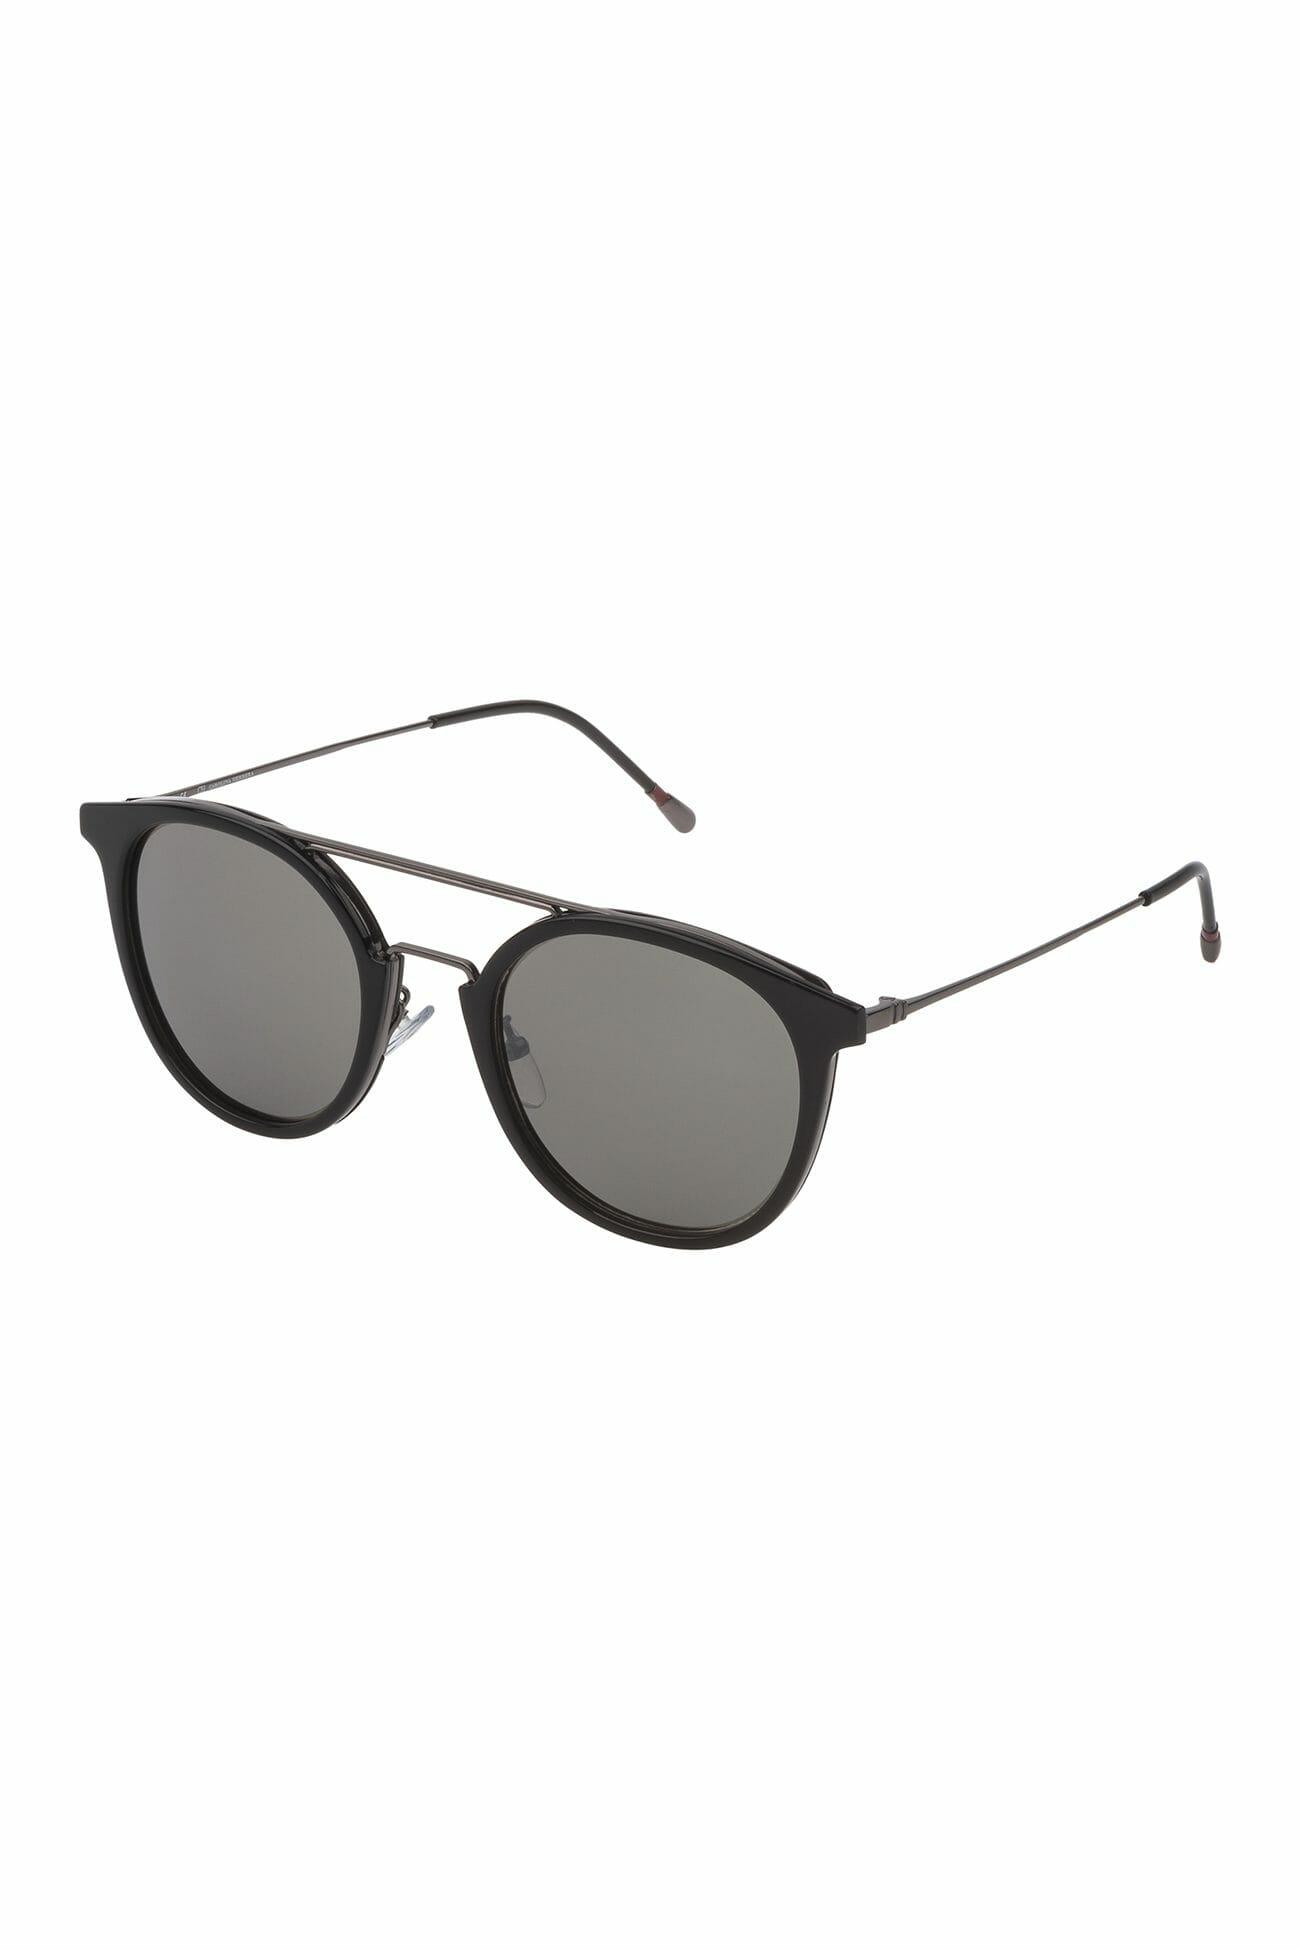 CH-Carolina-Herrera-Eyewear-Men-Sunglasses